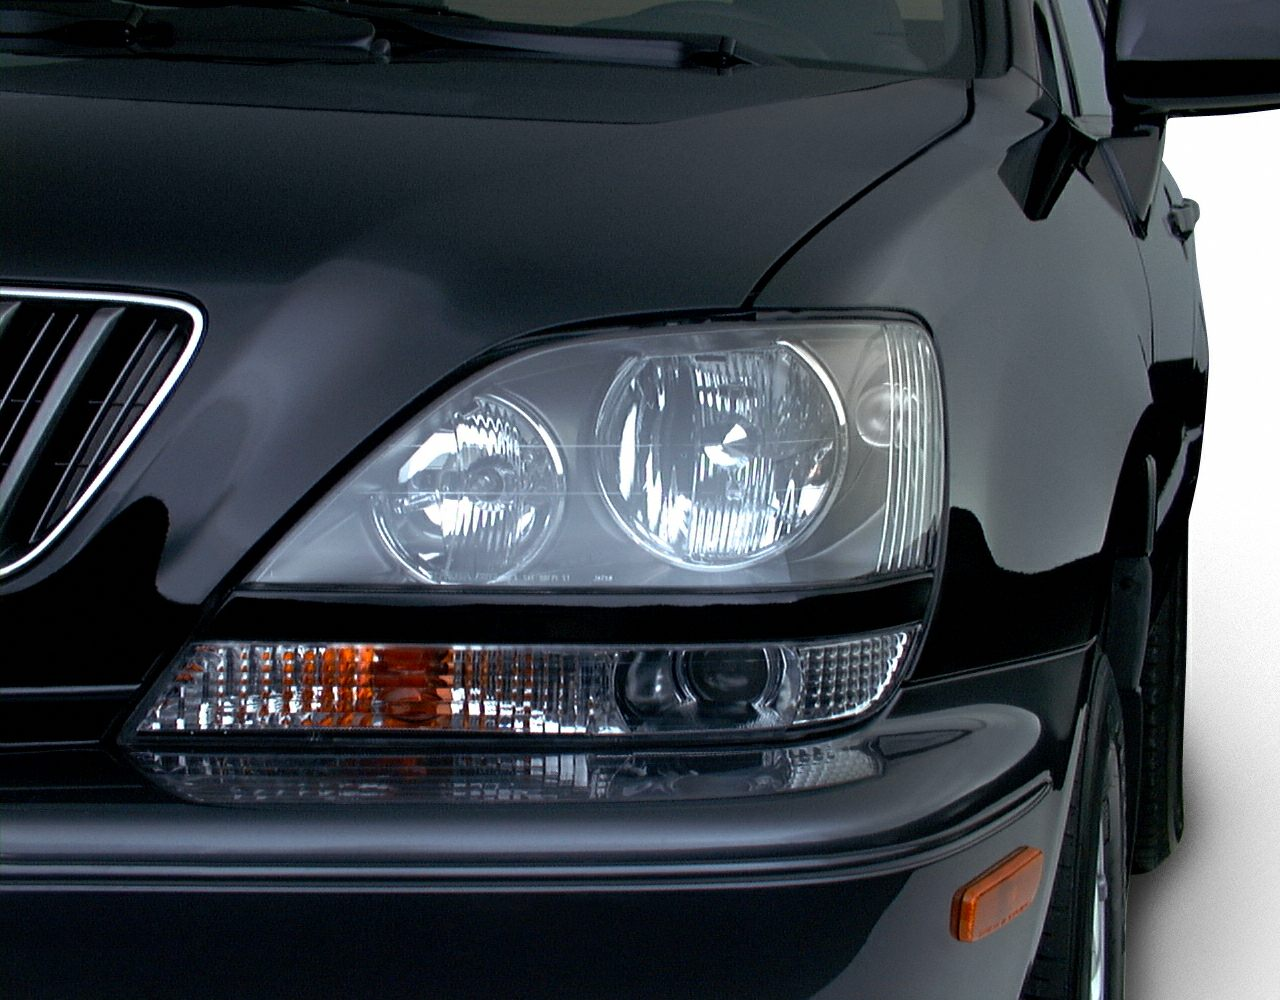 2000 Lexus RX 300 Exterior Photo